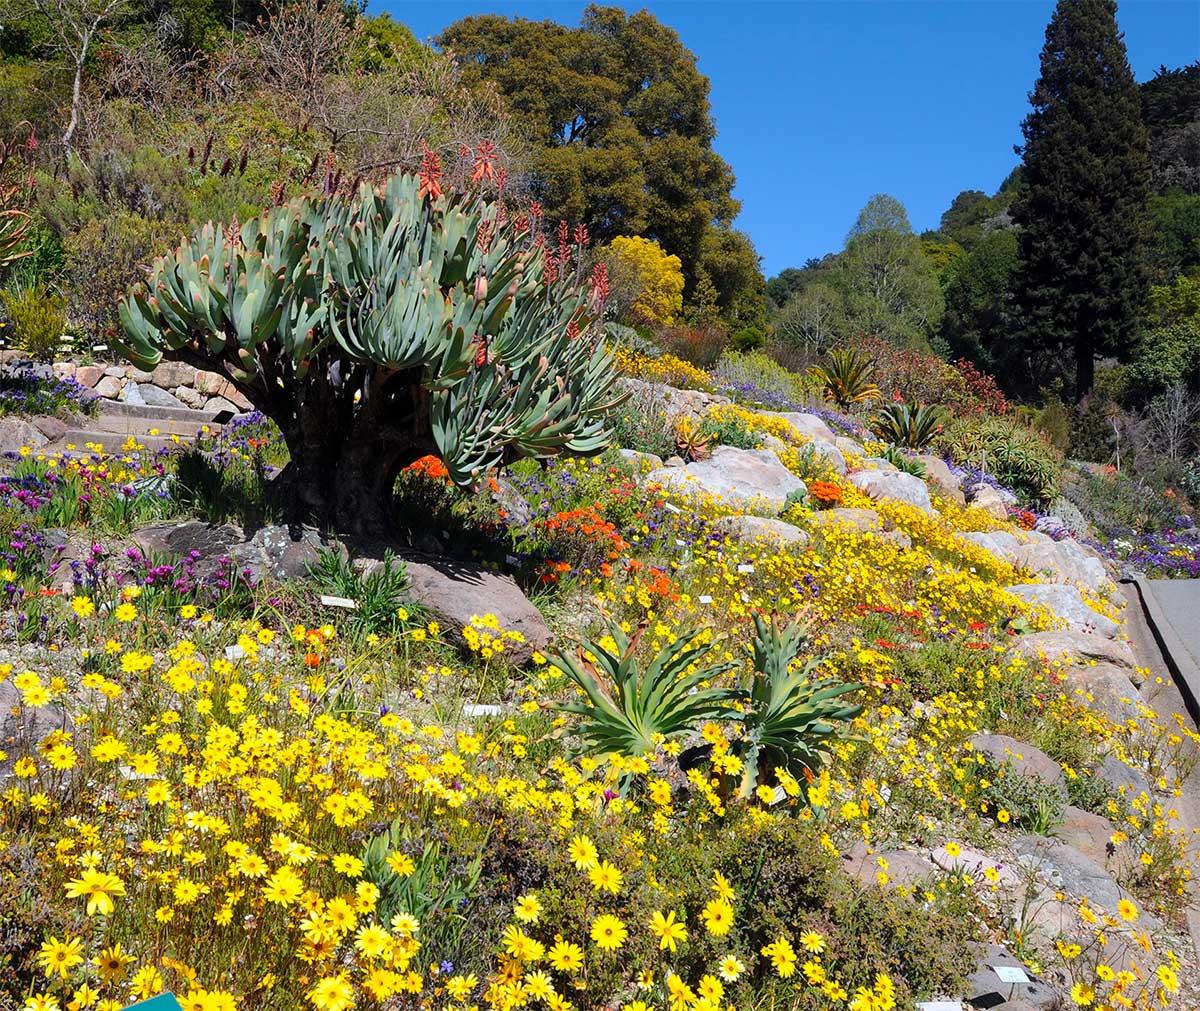 UC Berkeley botanical garden welcomes back public with dazzling 'super bloom'